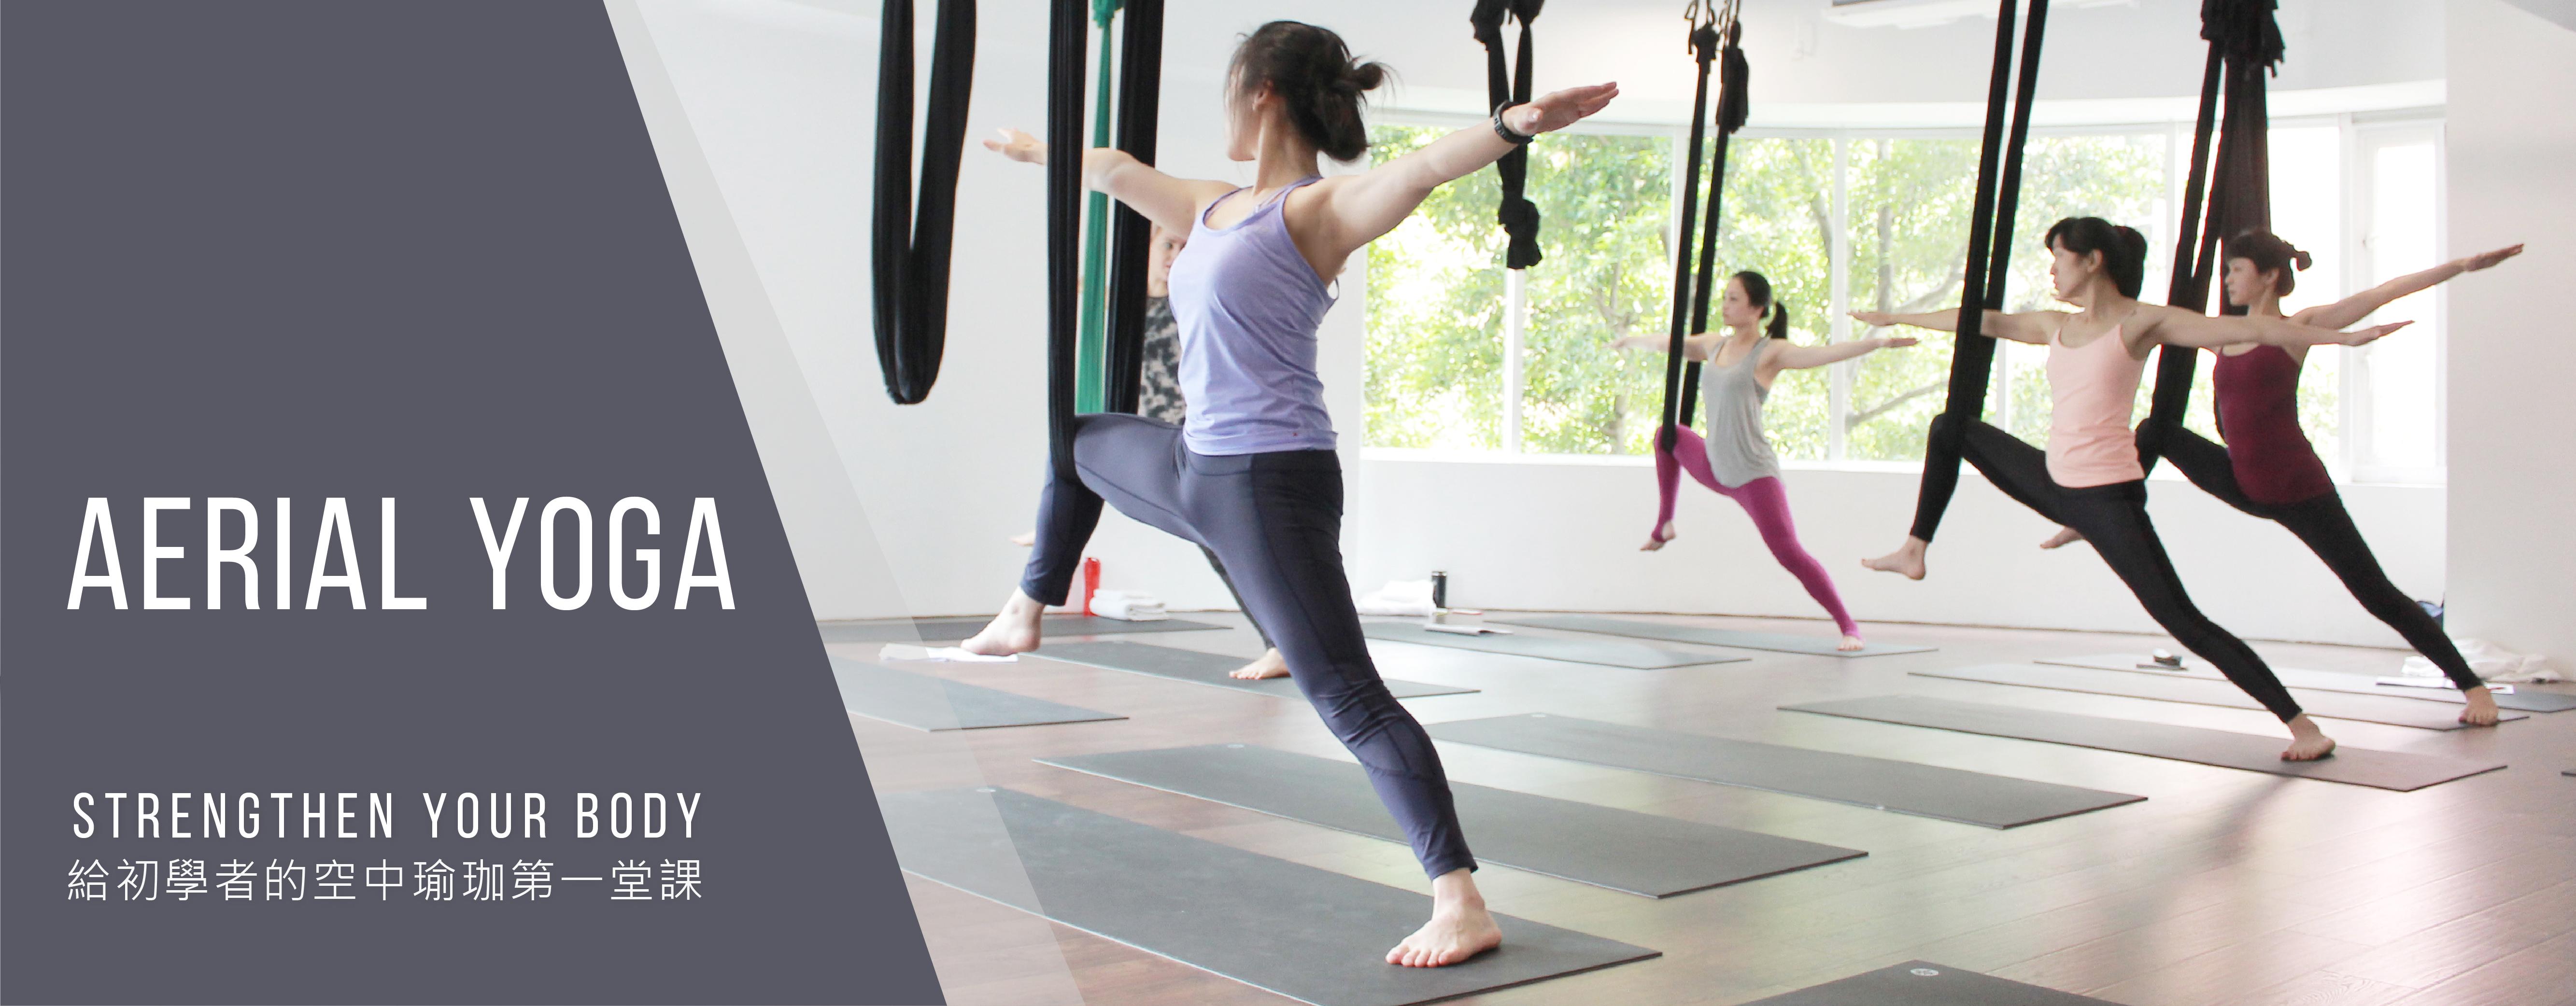 Yoga Journey 瑜珈旅程_空中瑜珈